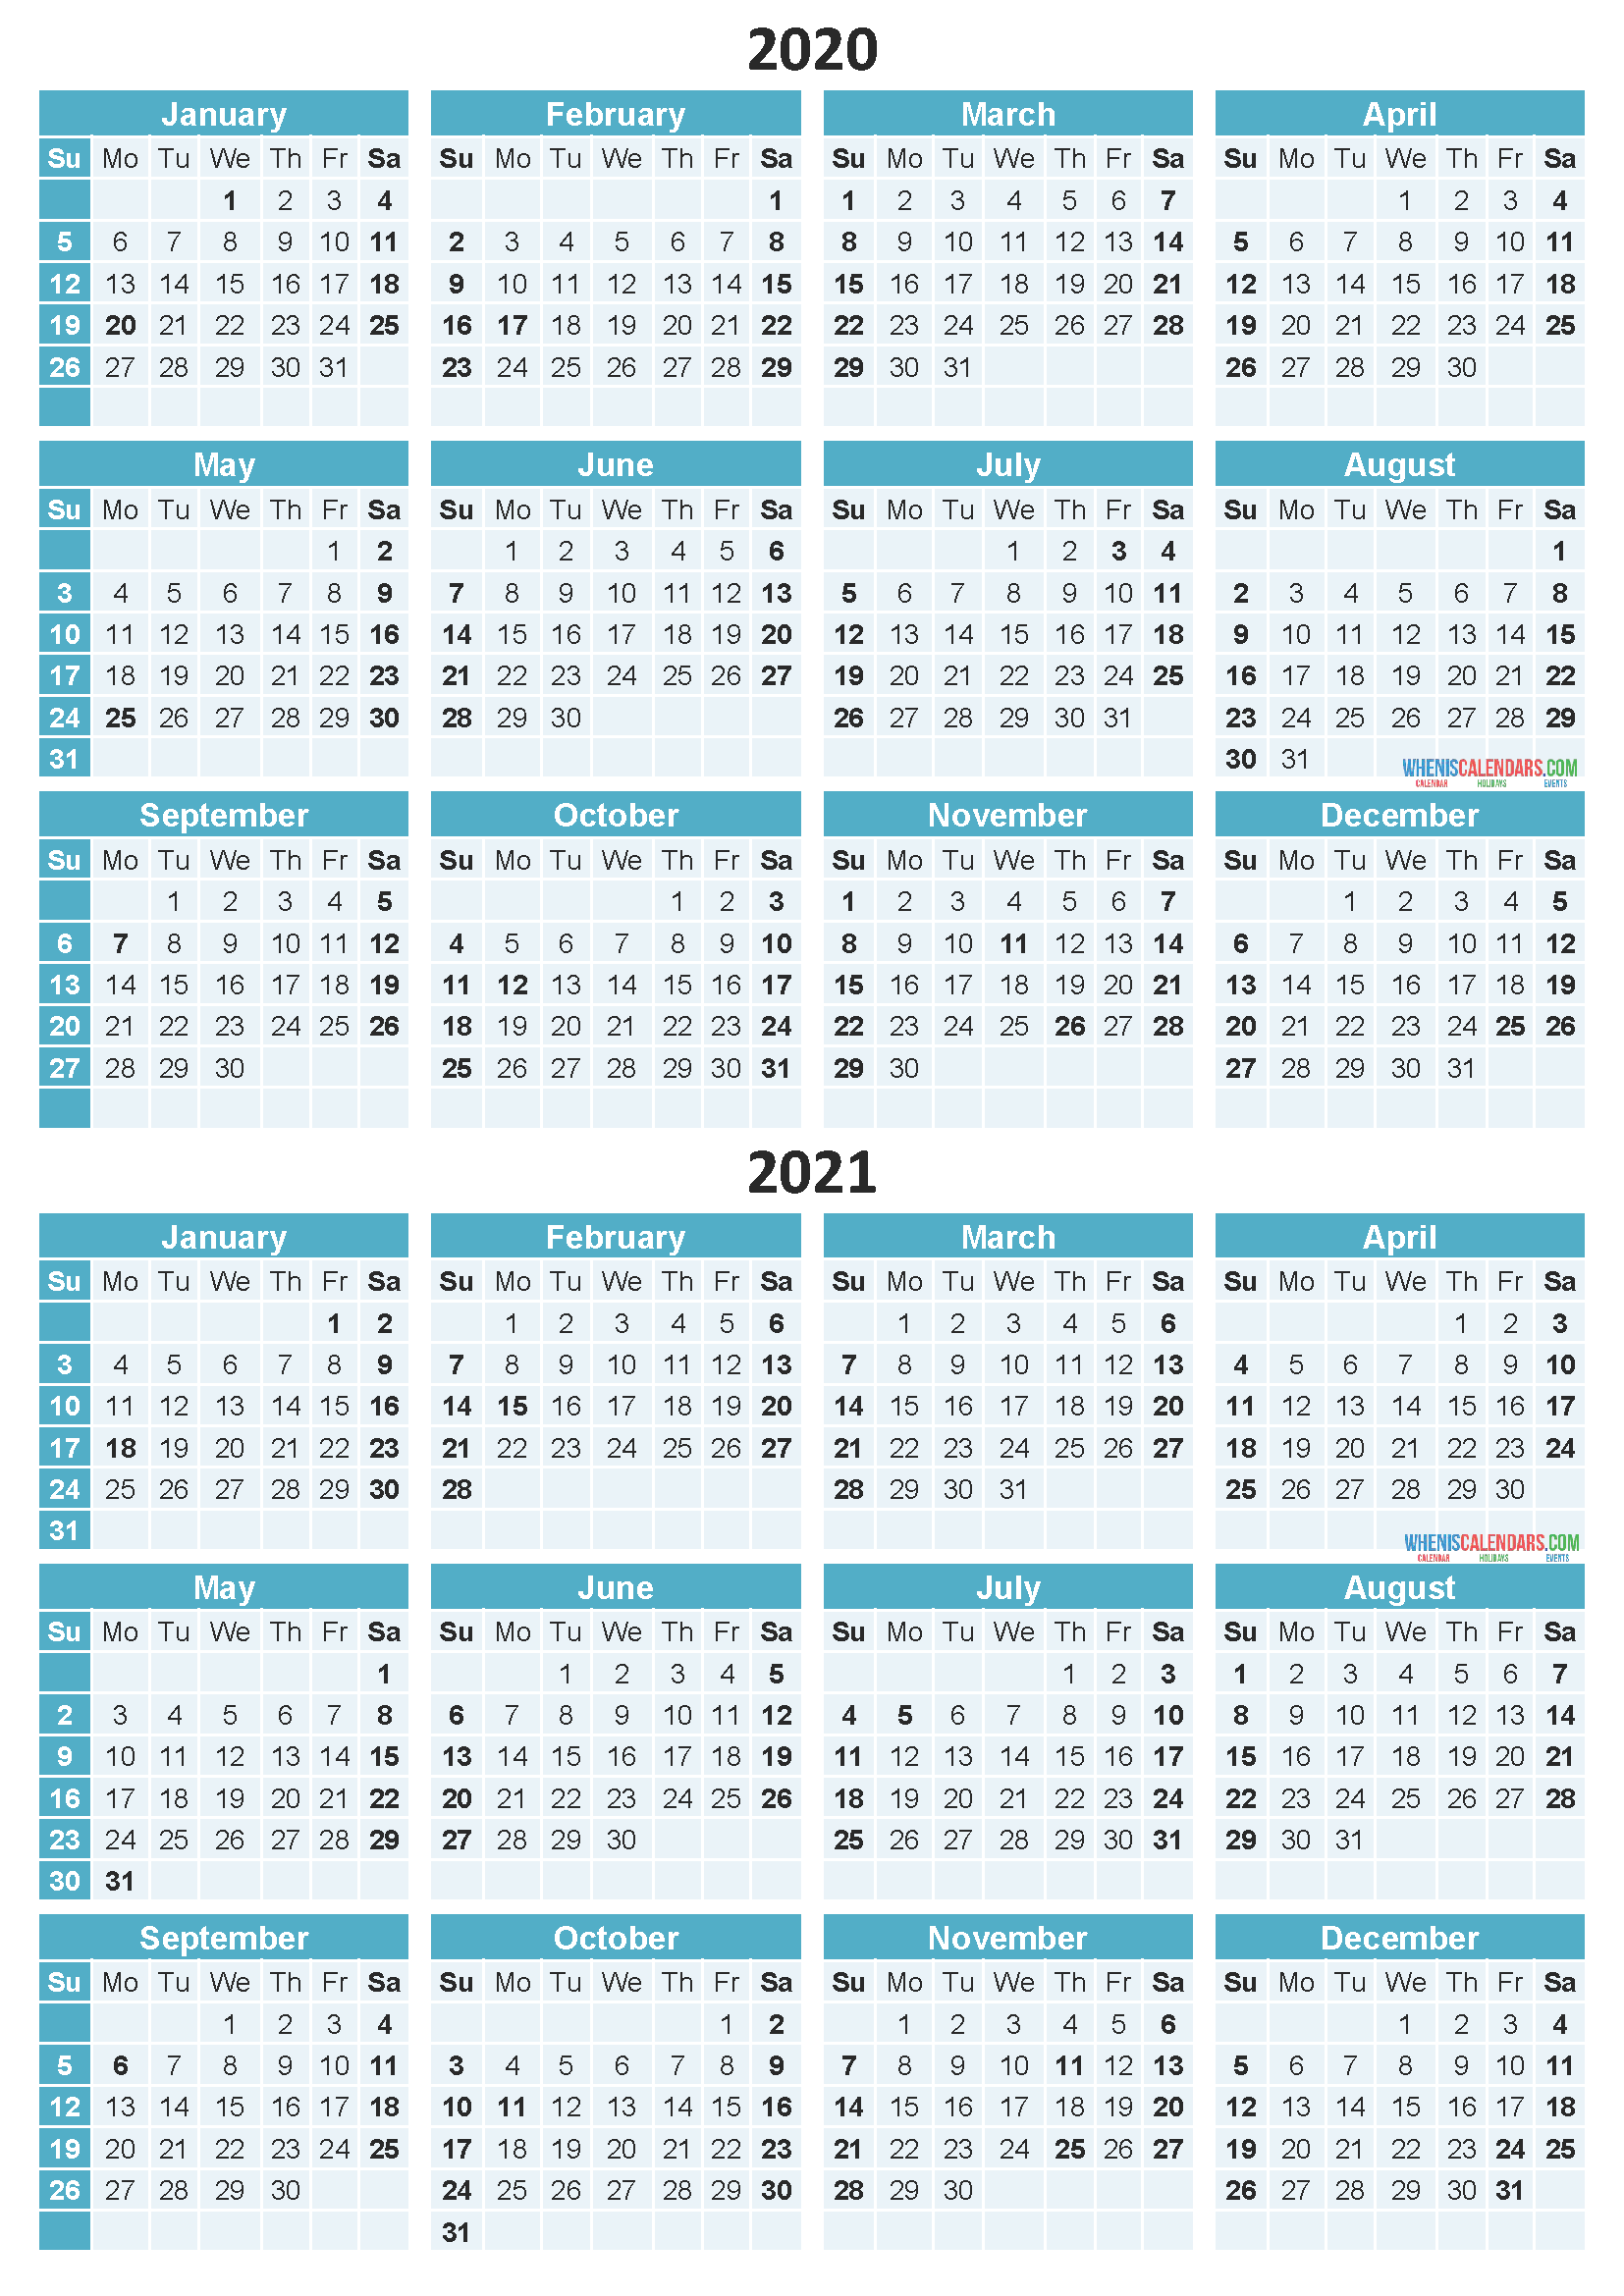 Free Printable 2020 and 2021 Calendar with Holidays PDF ...